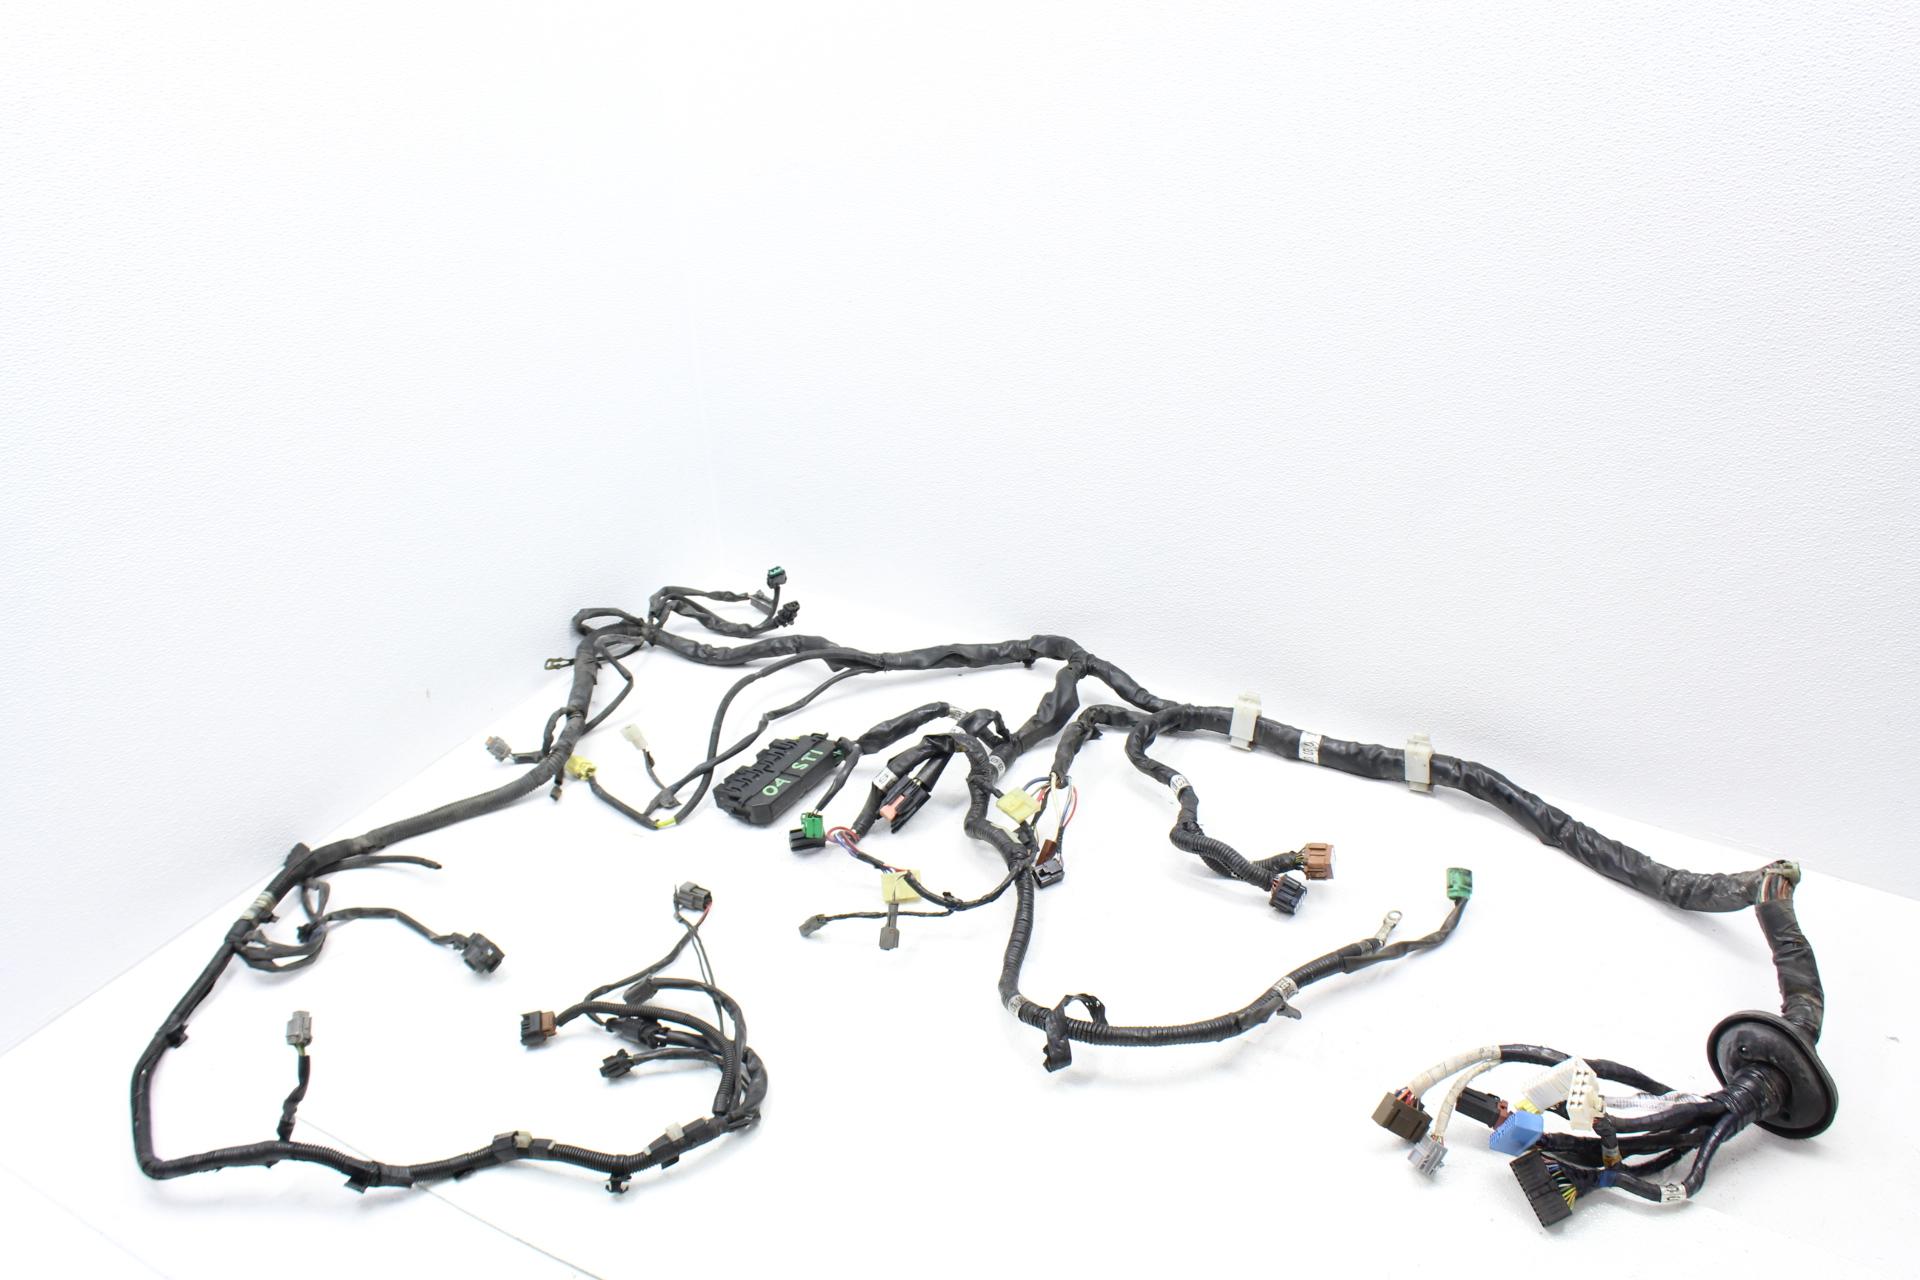 04 05 Subaru Wrx Sti Front Chassis Wire Wiring